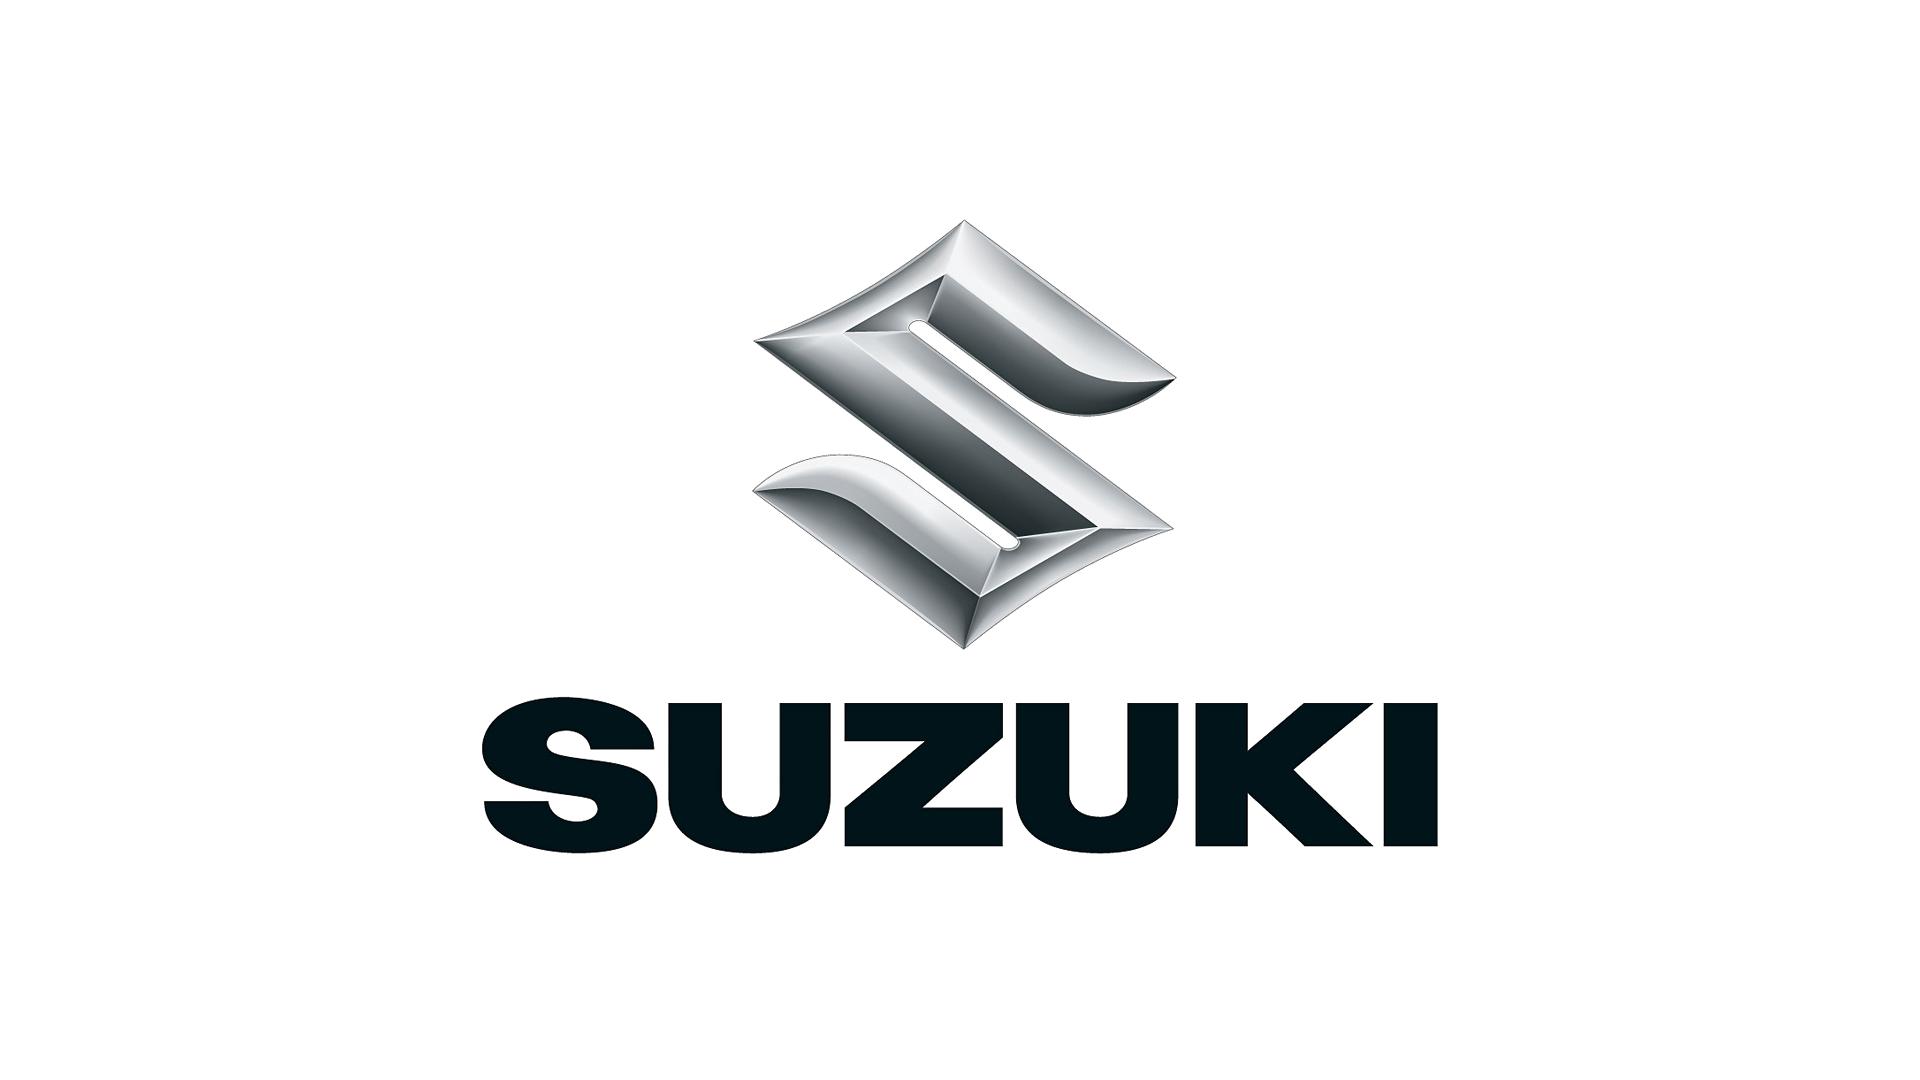 Suzuki Logo, HD Png, Meaning, Information